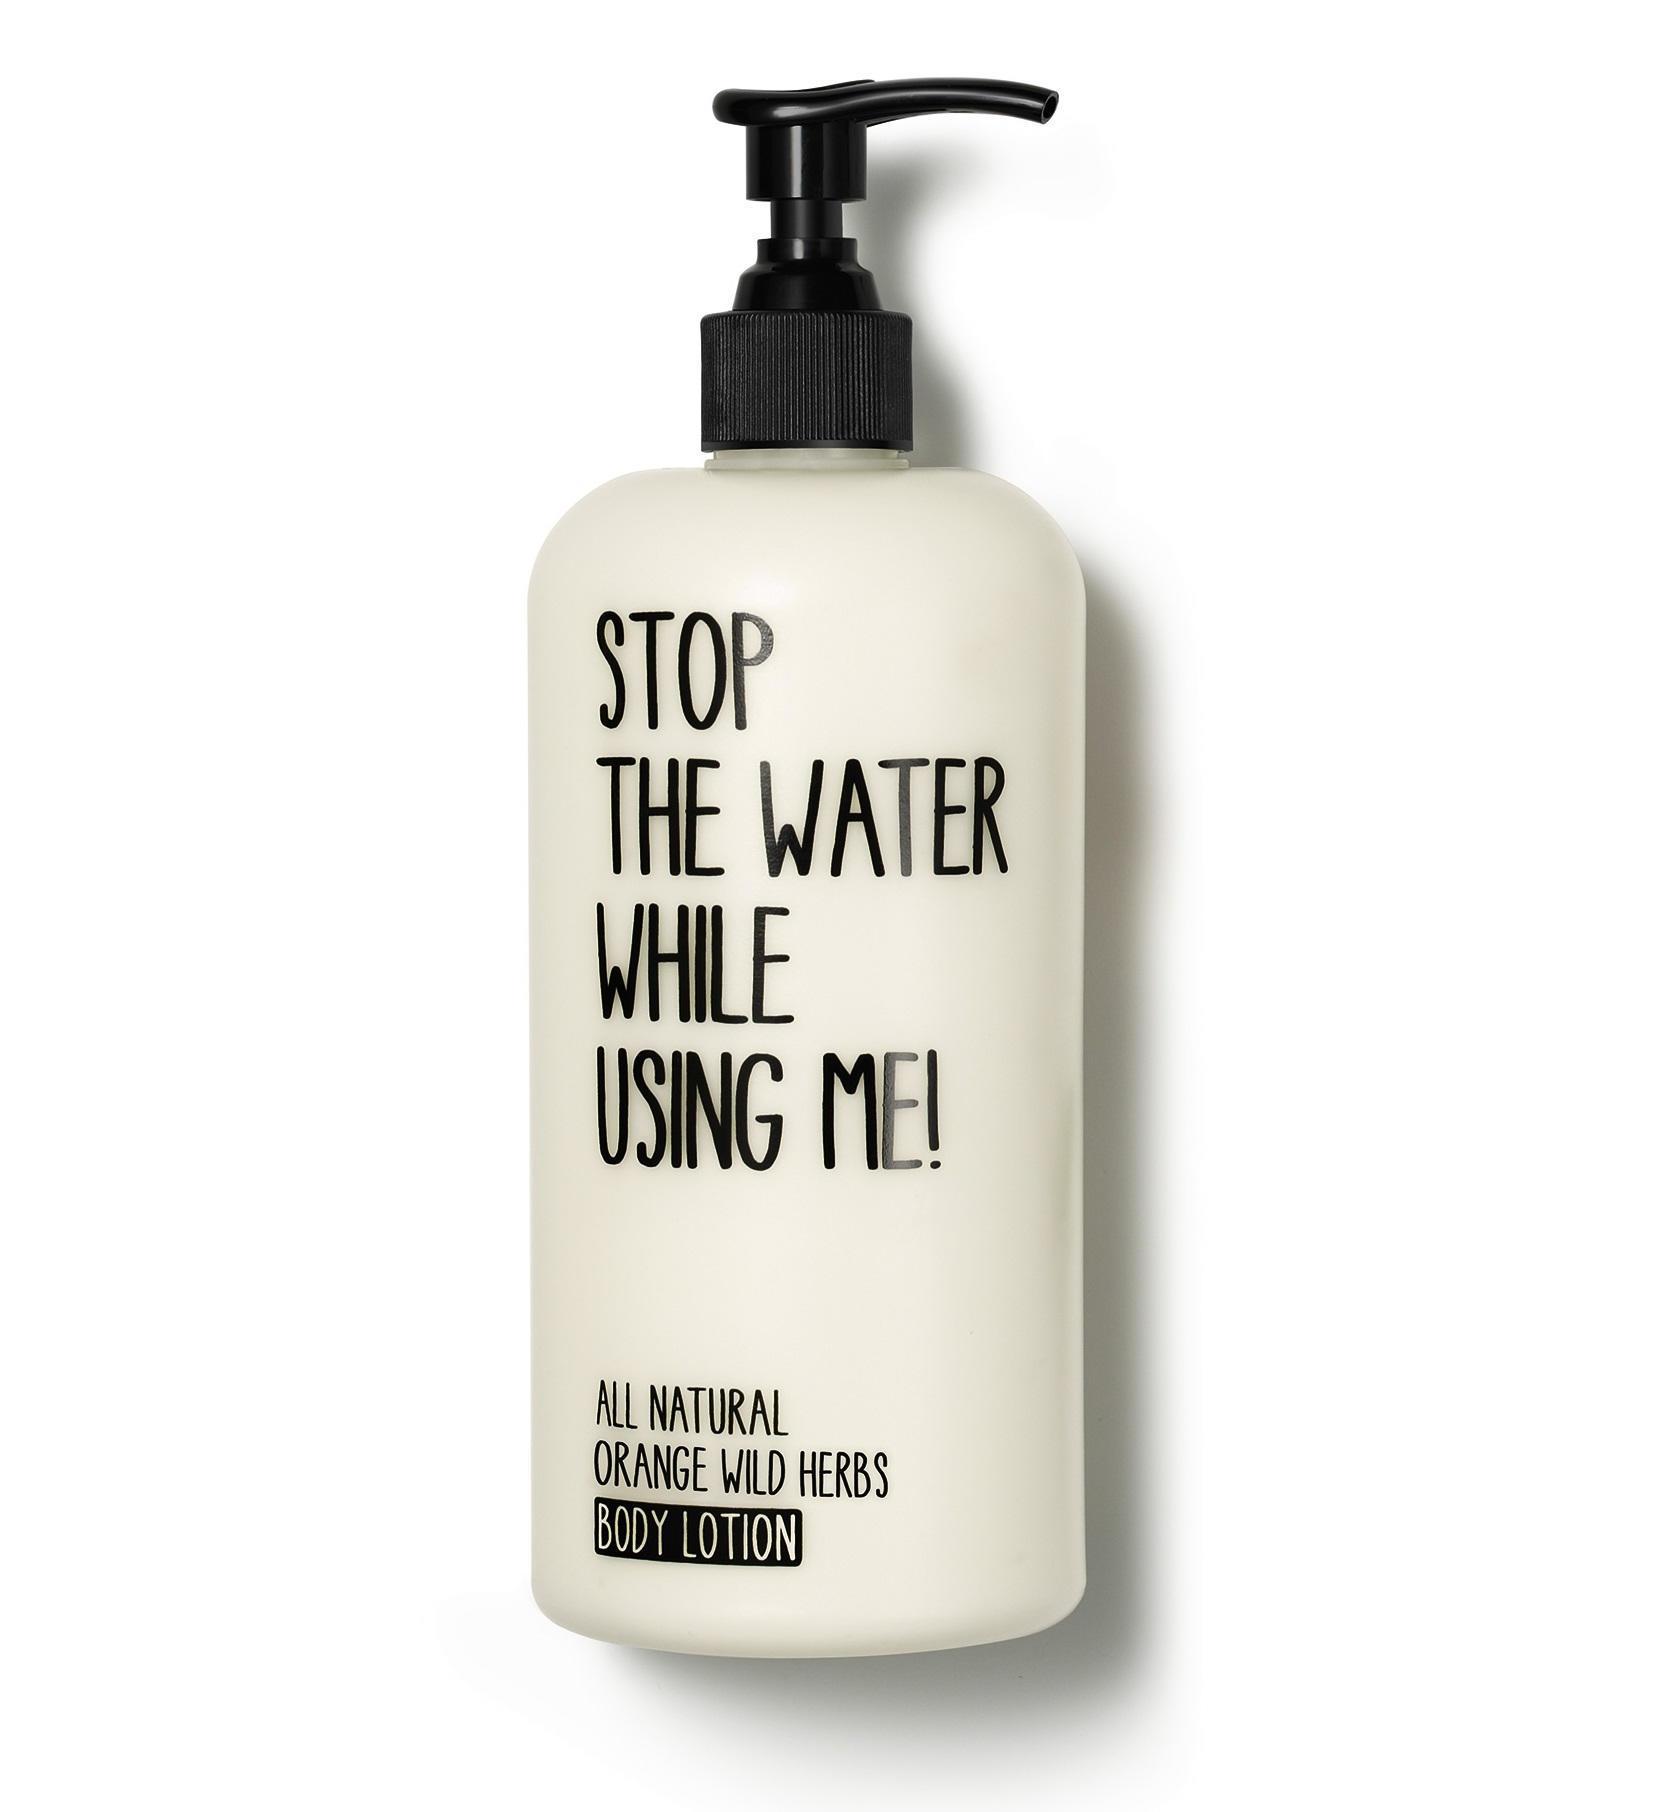 STOP THE WATER WHILE USING ME! Tělové mléko Orange Wild herbs 200 ml, černá barva, bílá barva, plast